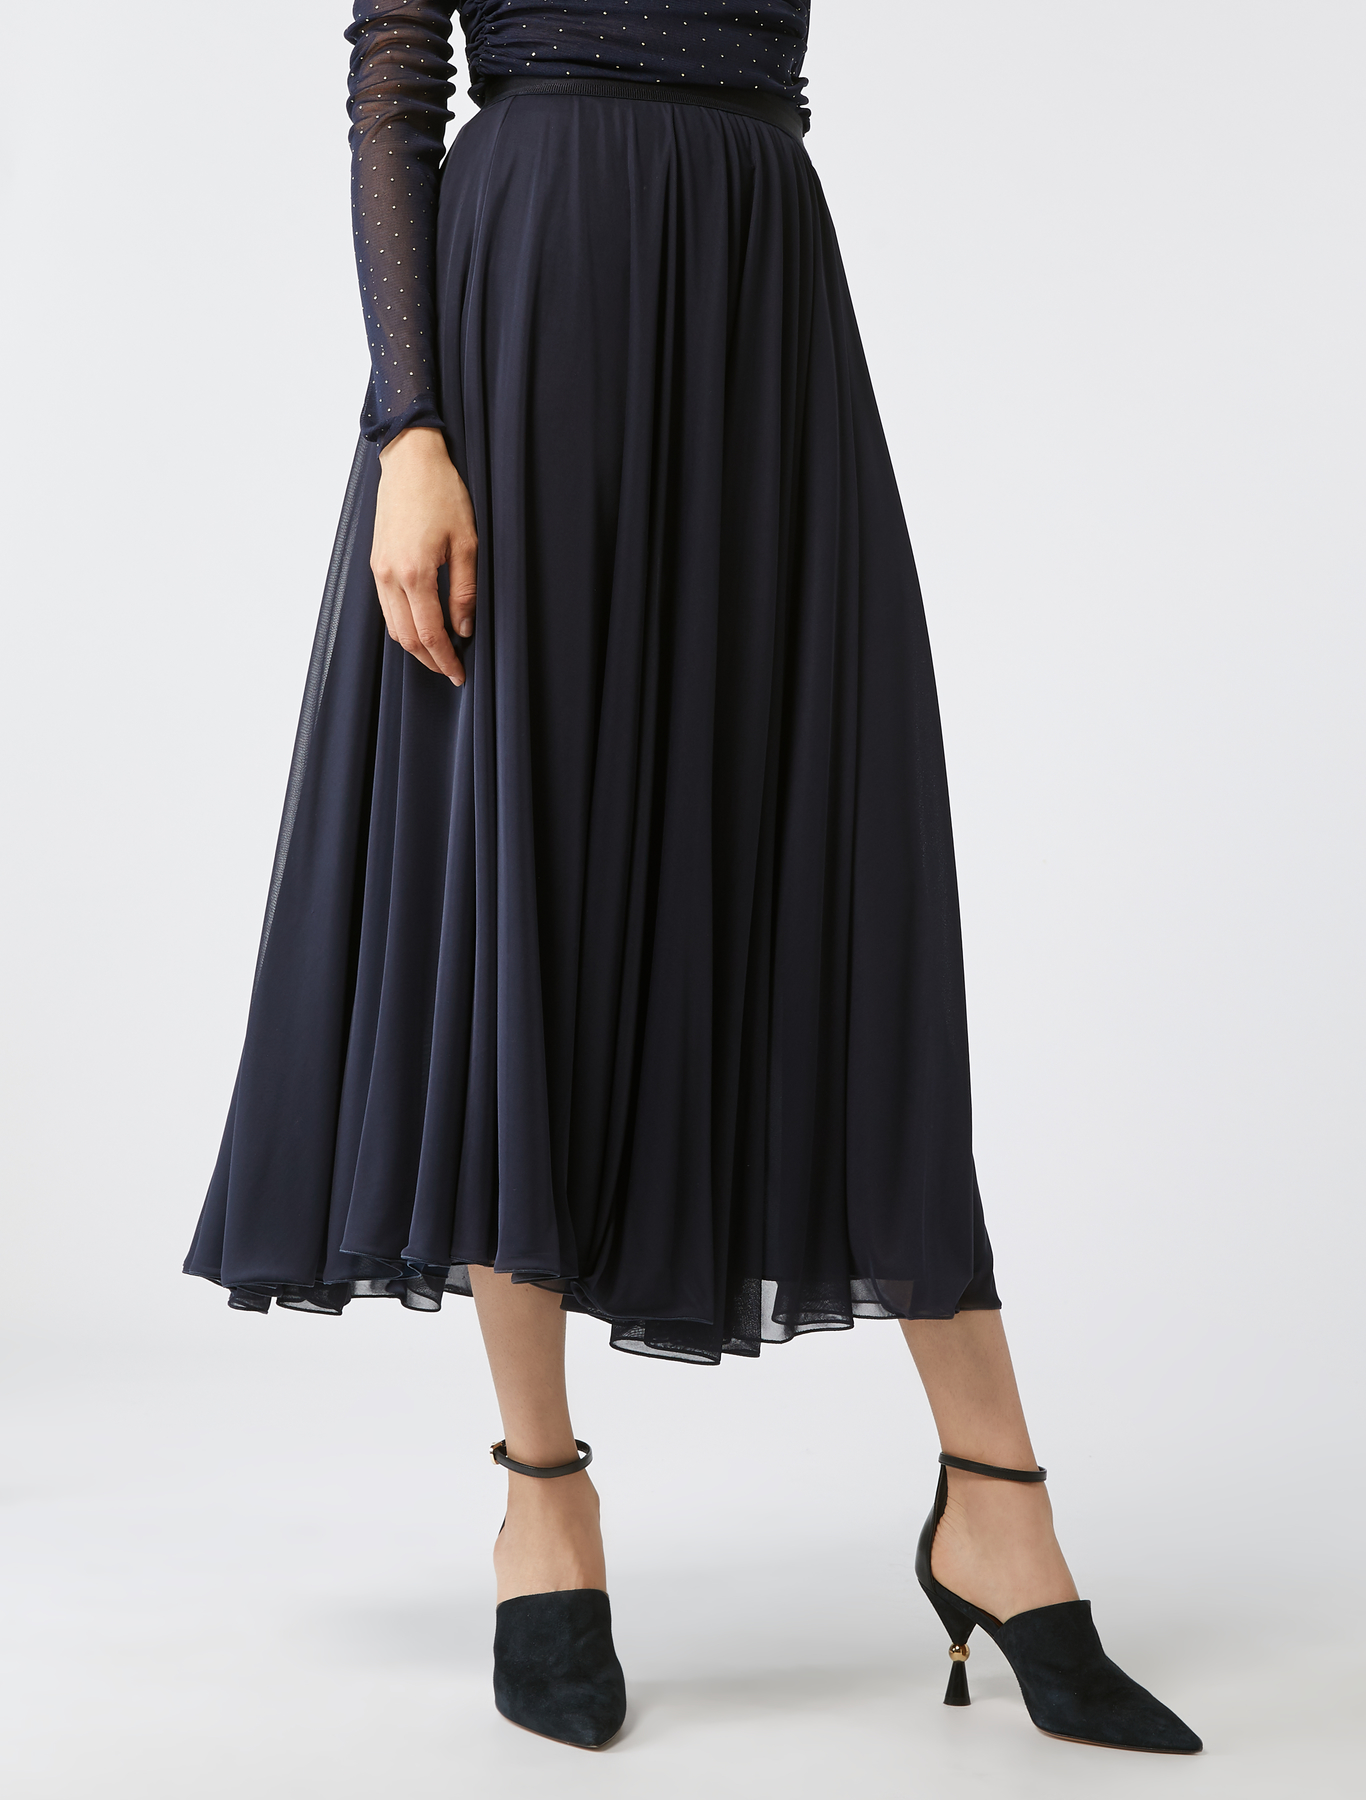 761cbe01d546 Semi-sheer full midi-skirt, midnight blue - Max&Co.